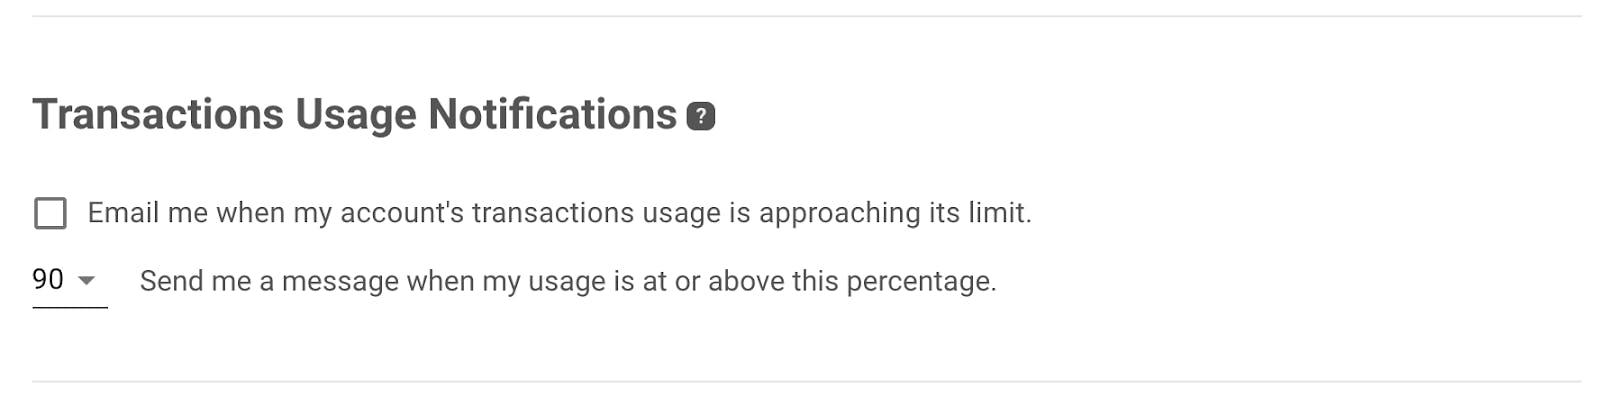 Transactions usage notifications.